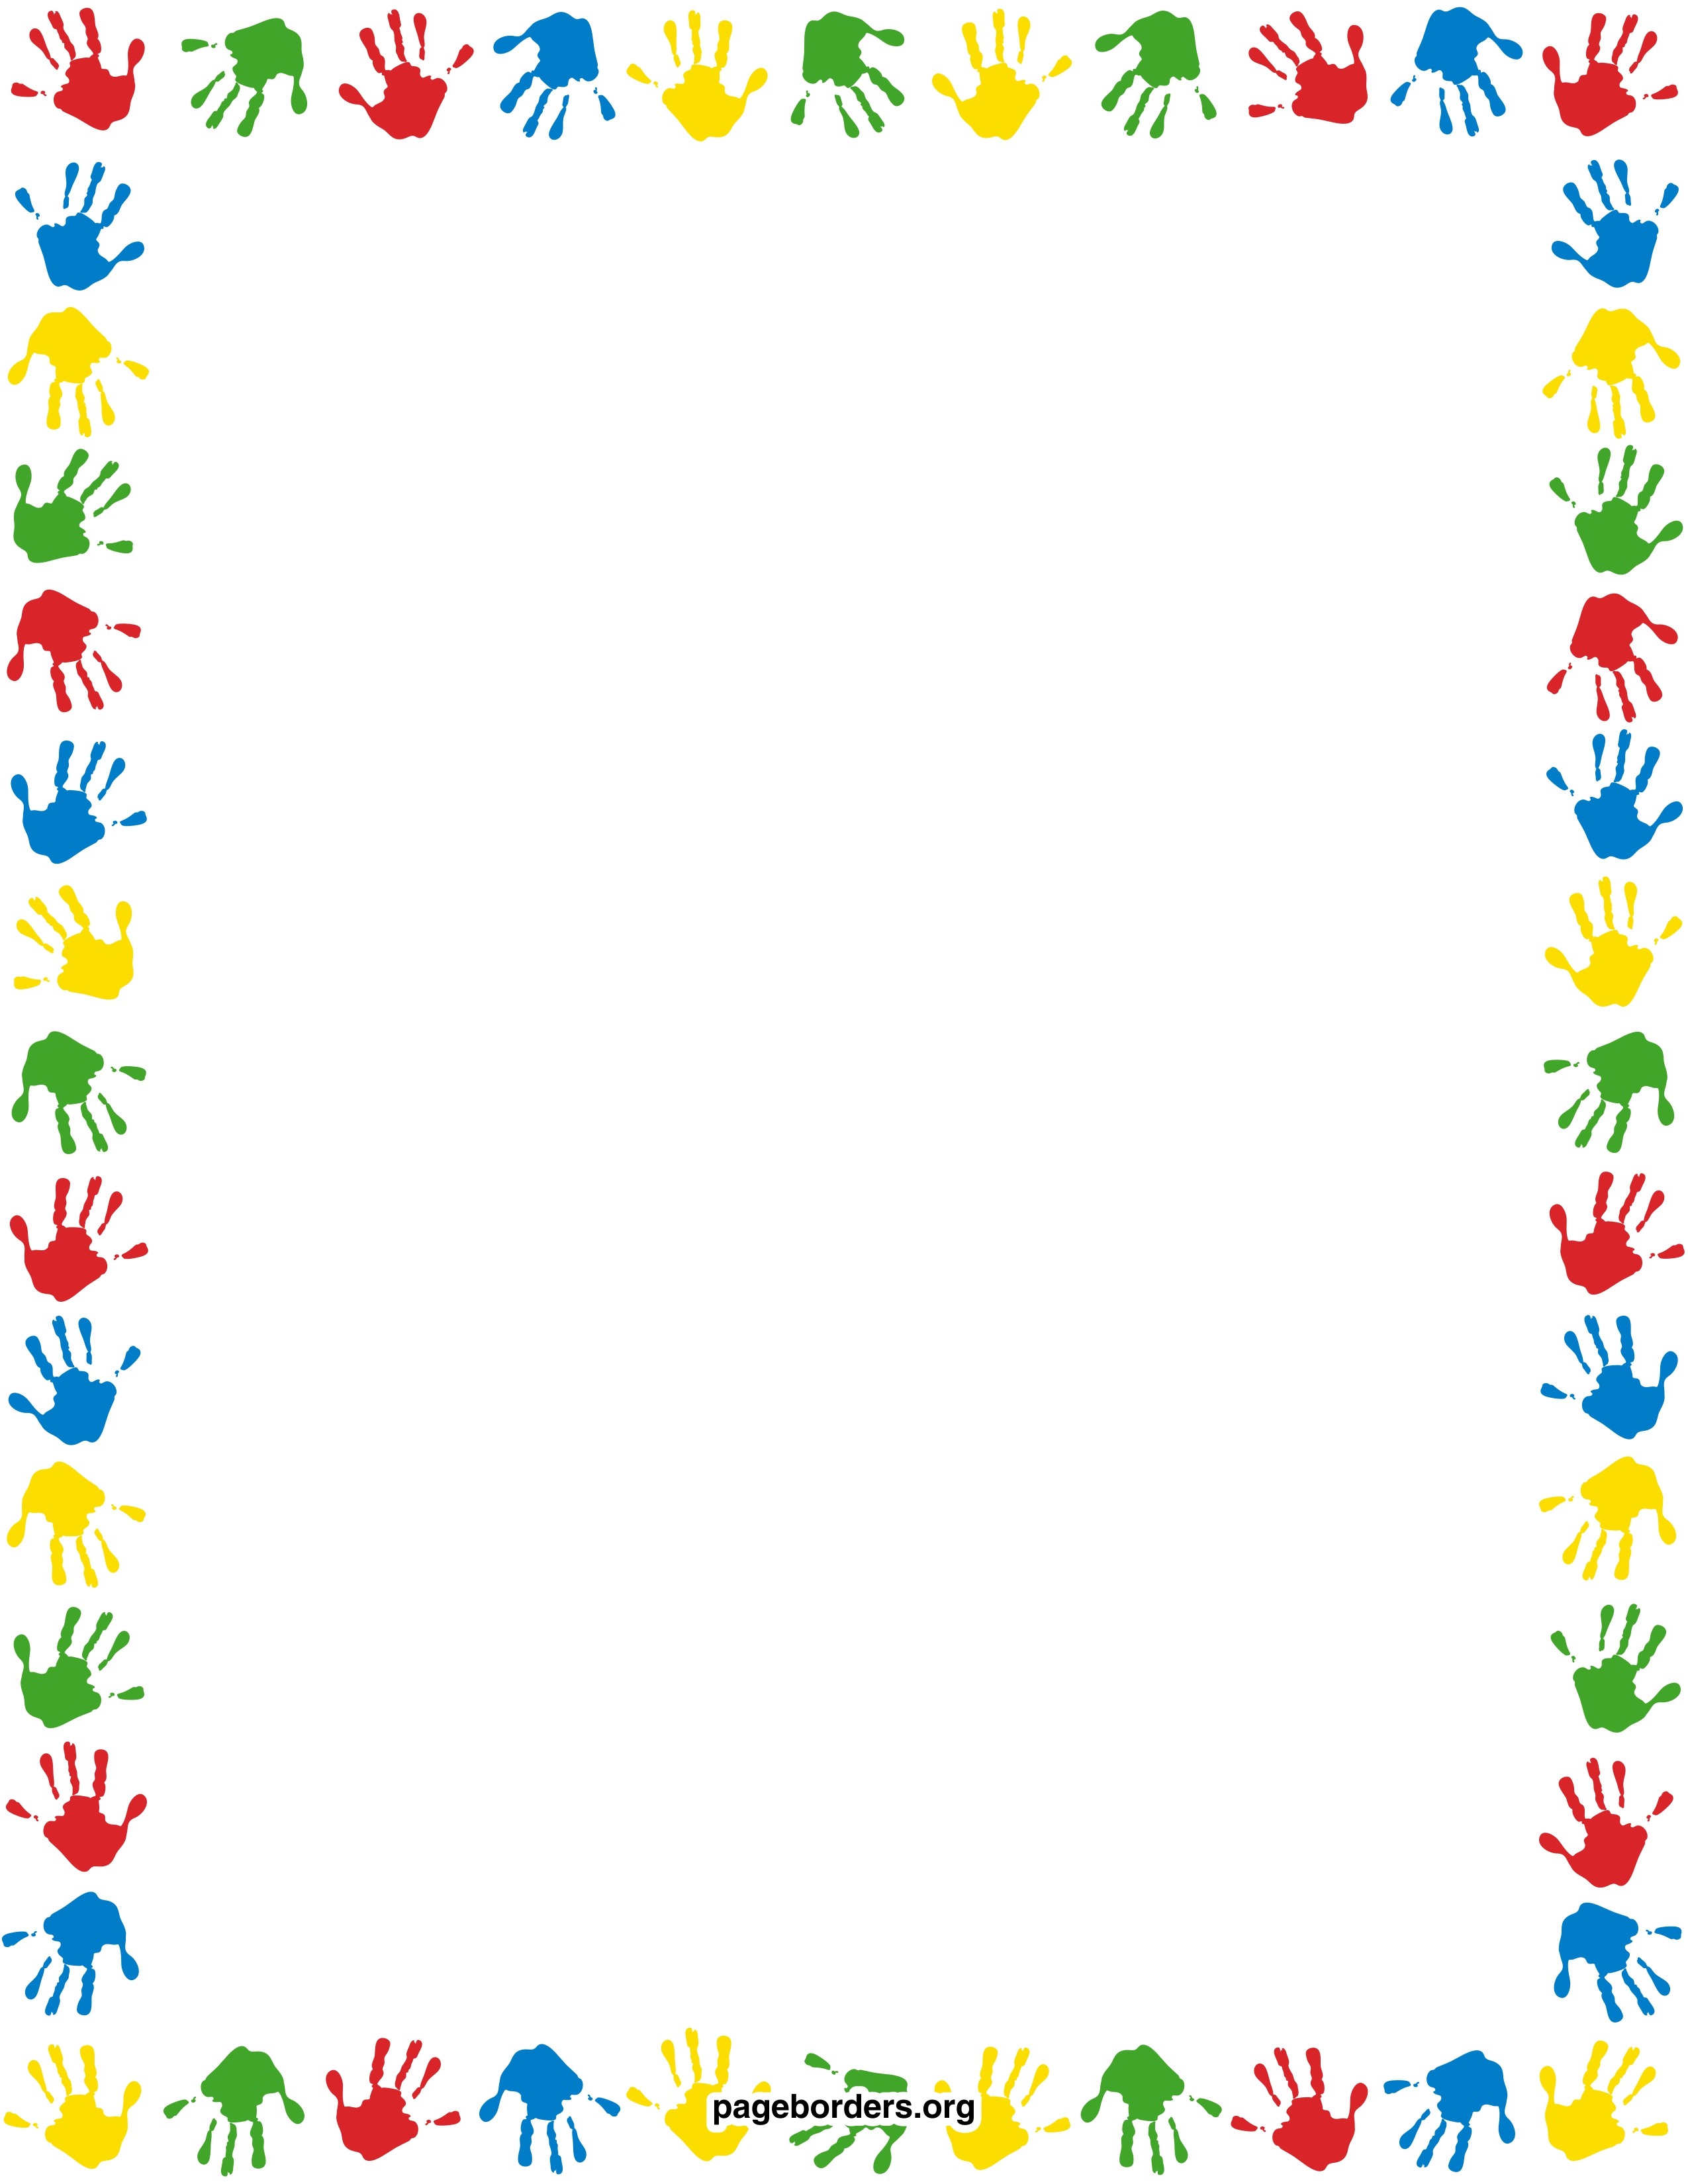 Preschool border clipart clipartfest